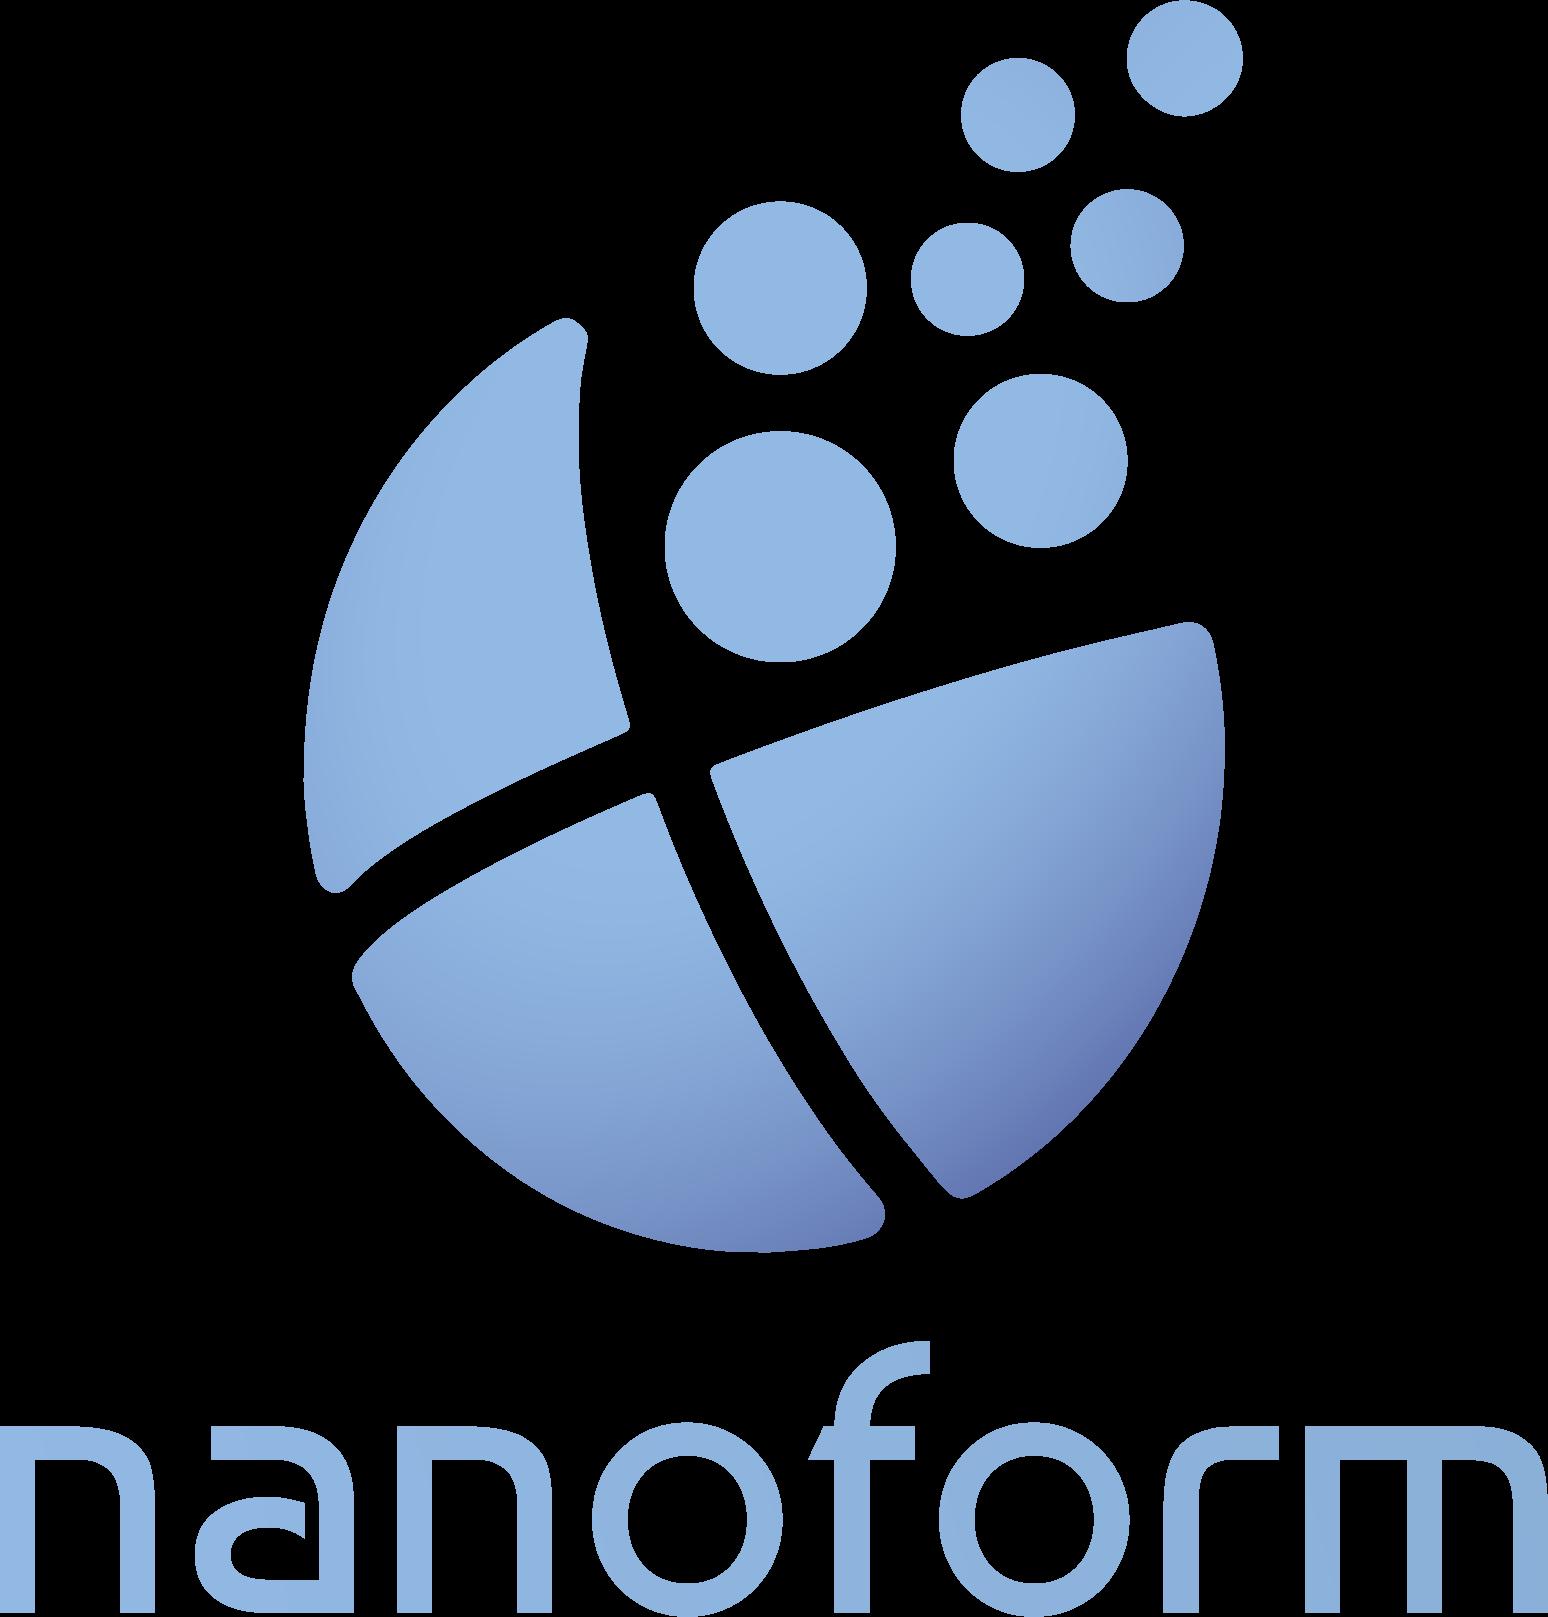 Nanoform